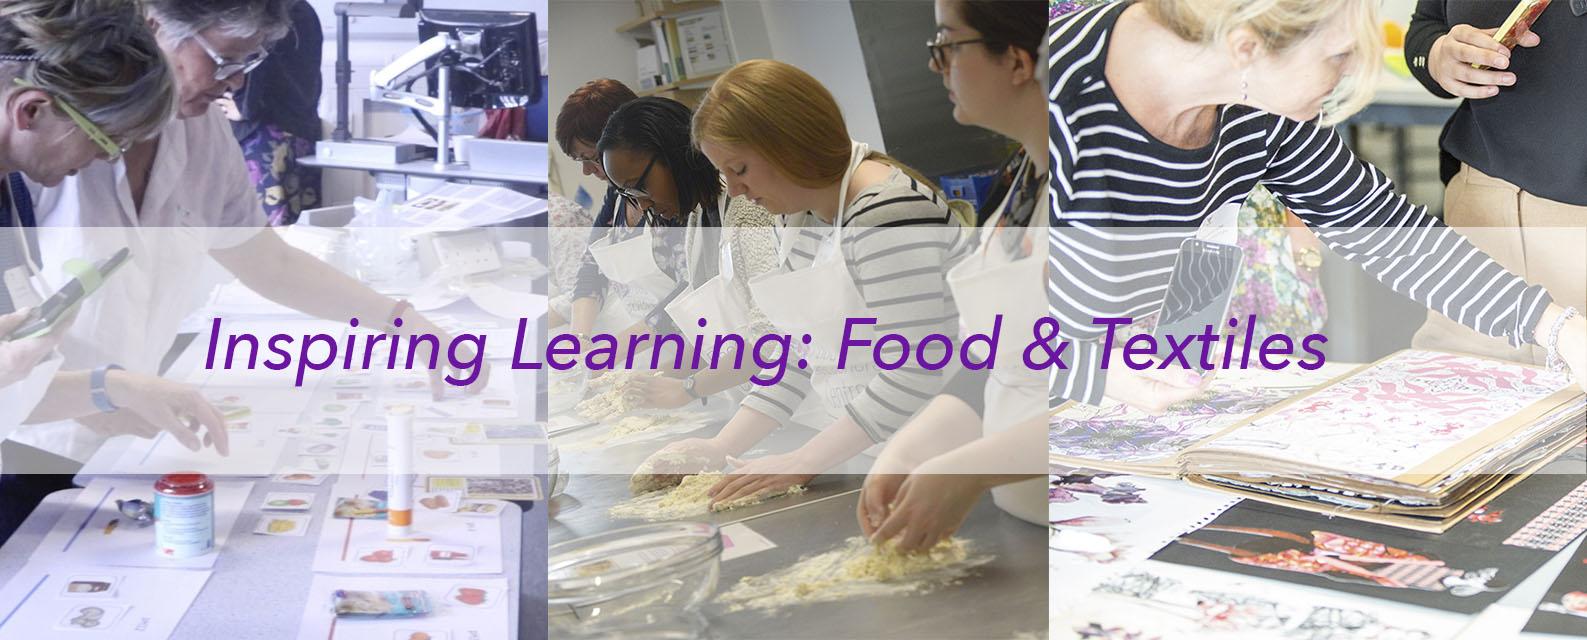 Food & Textiles Teachers Event Collage